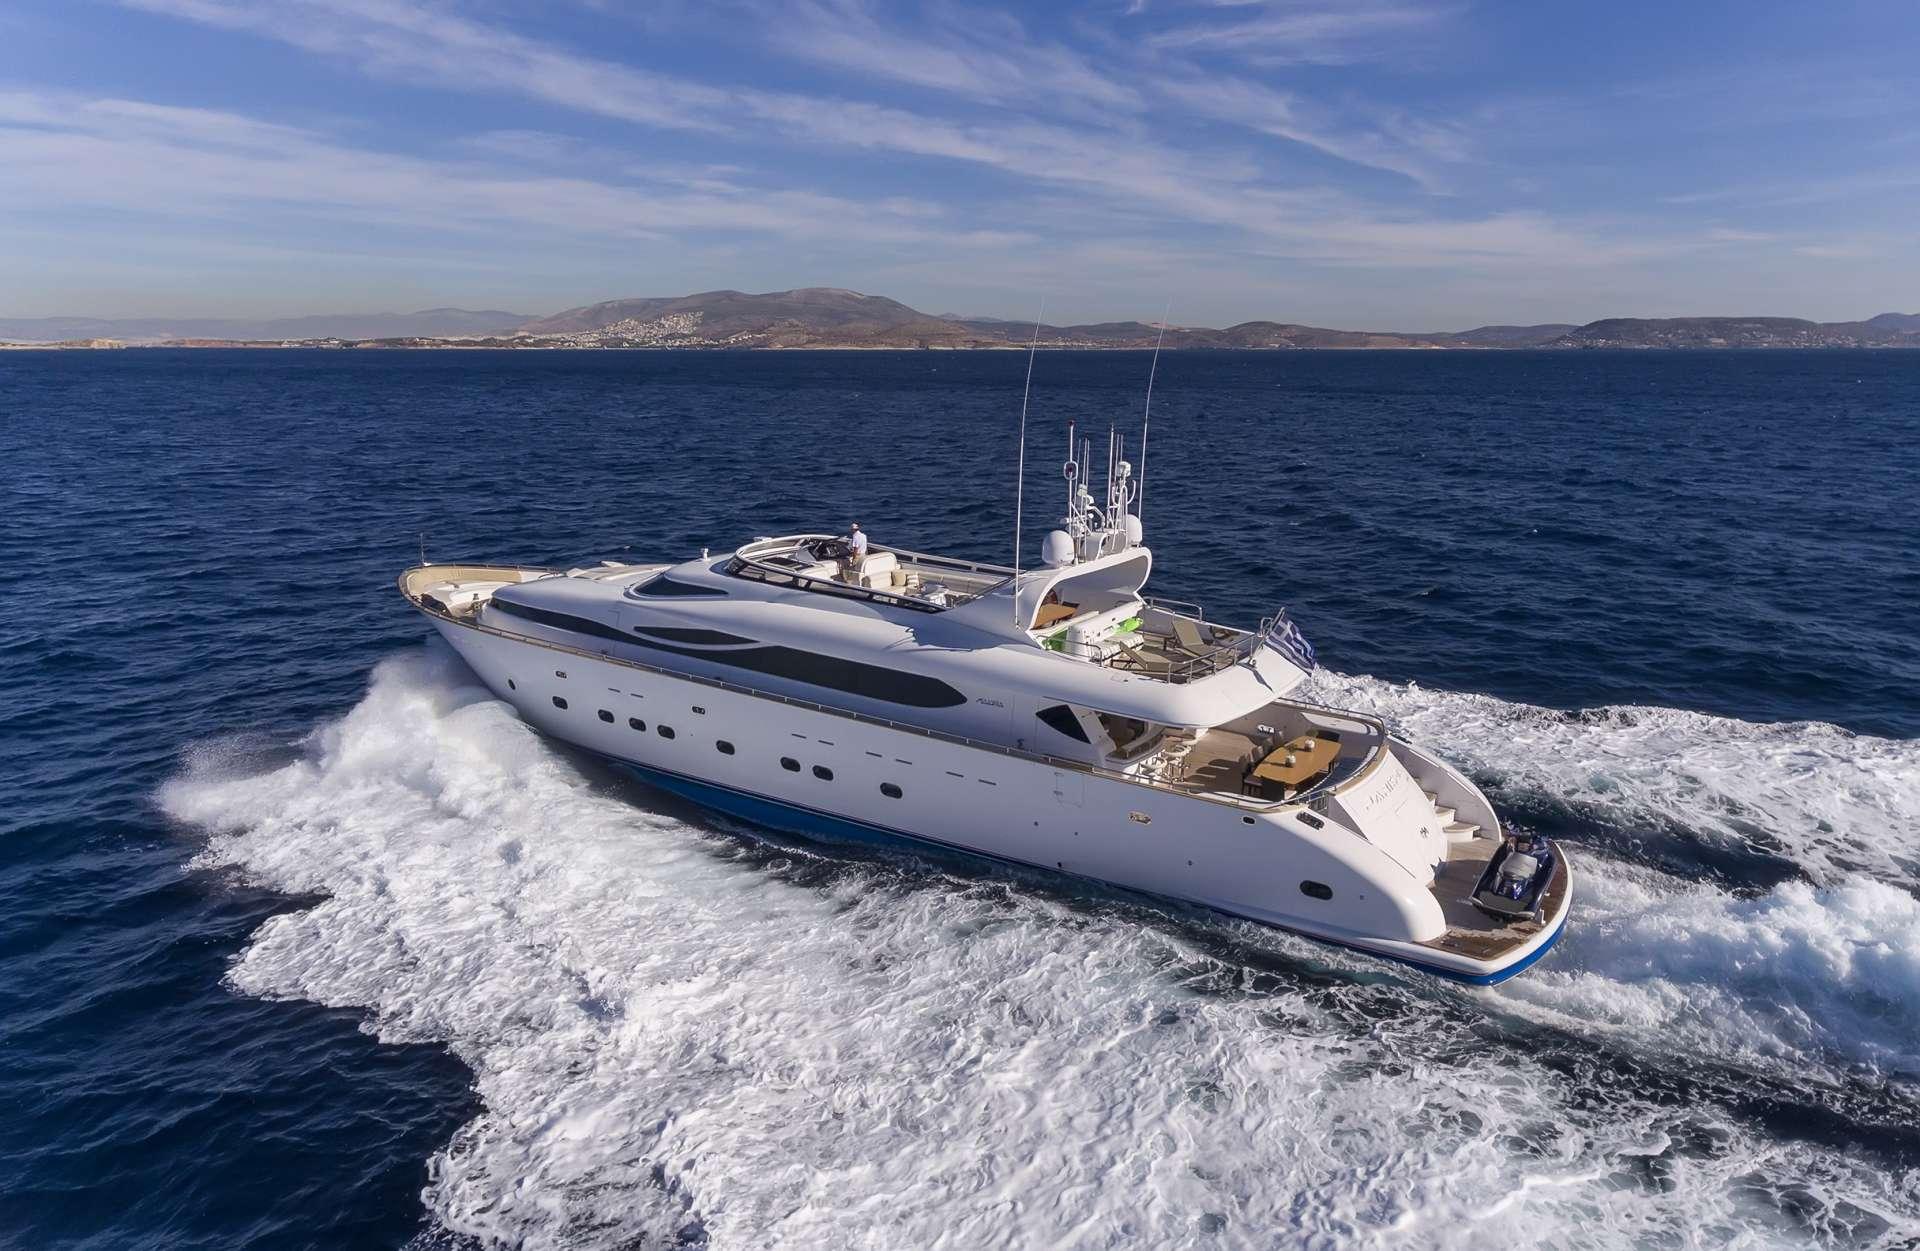 Power Yacht 'Power', 12 PAX, 6 Crew, 115.00 Ft, 35.06 Meters, Built 2009, Majora, Refit Year 2013